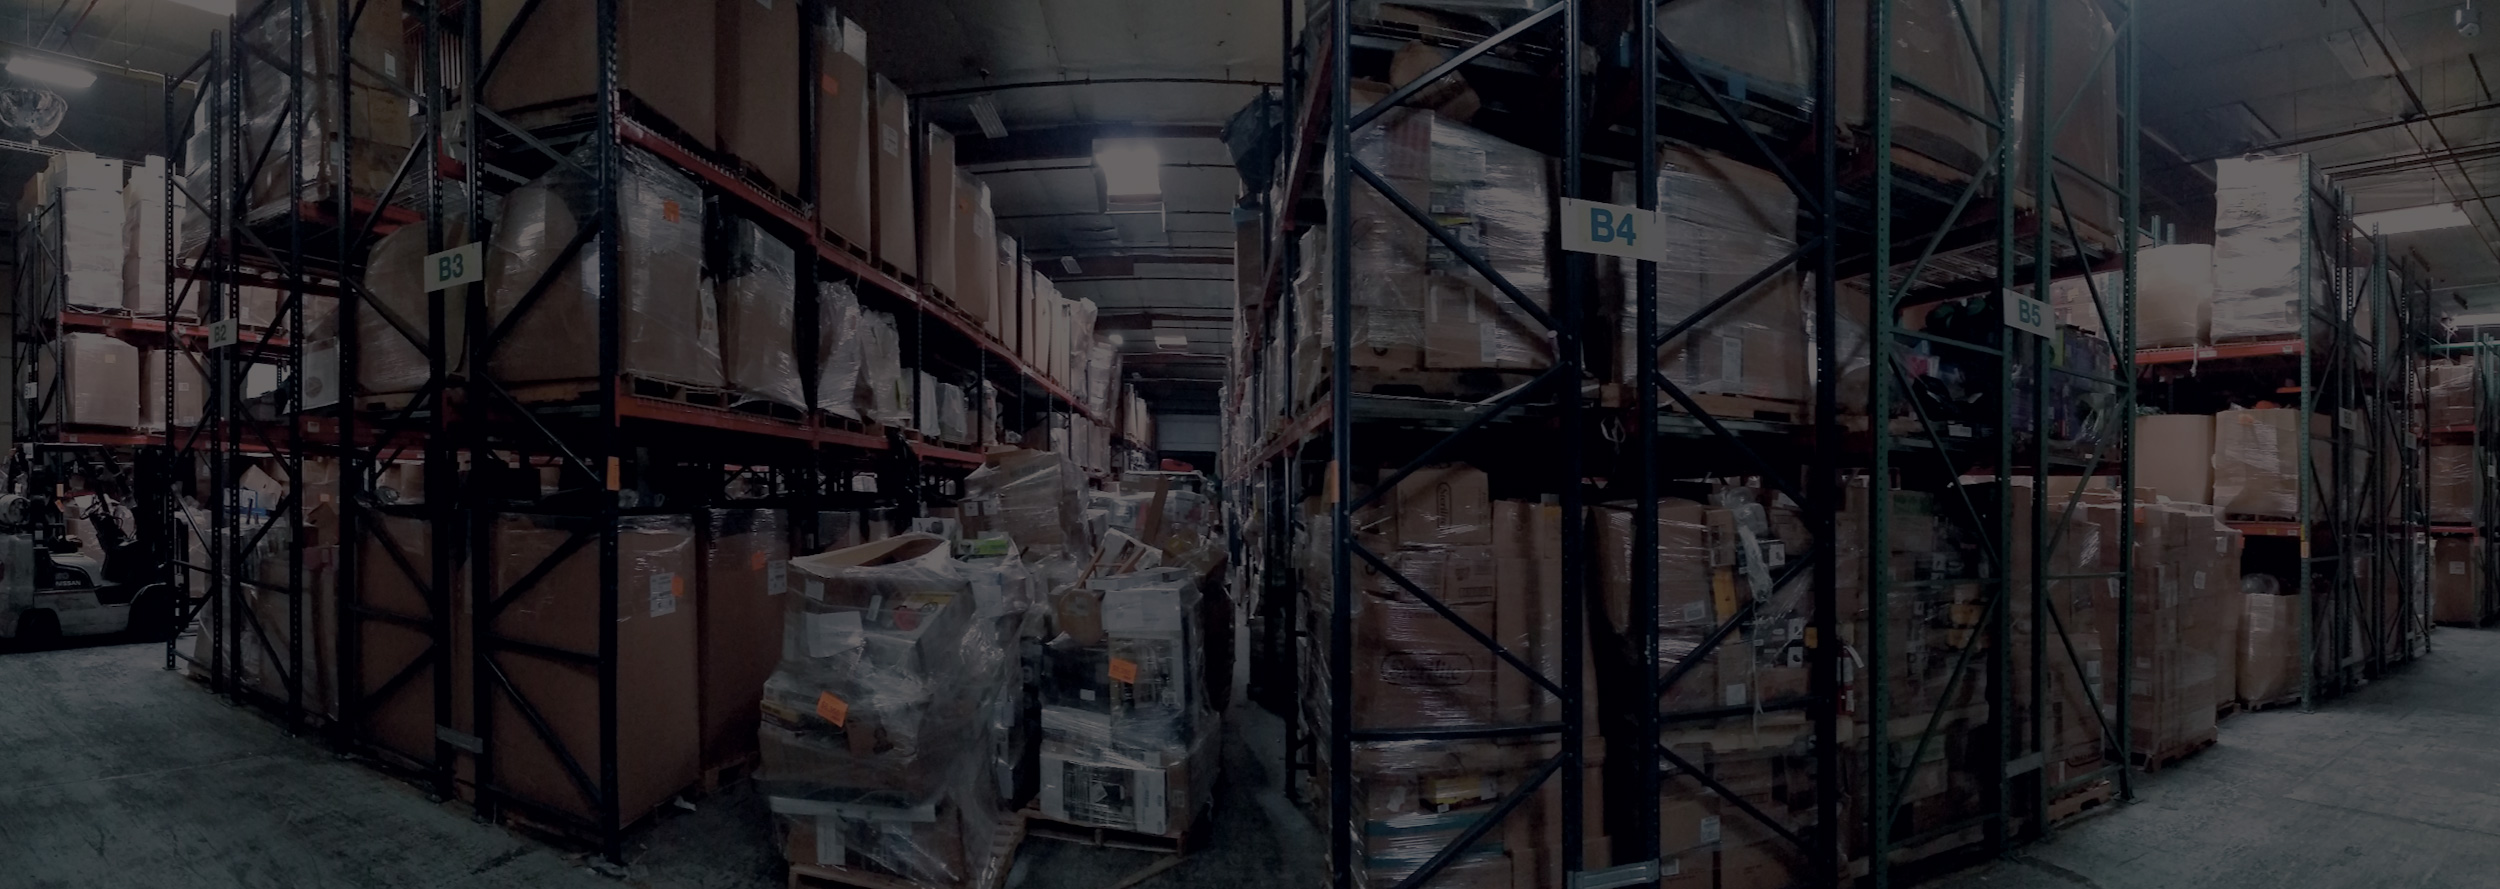 240,000 sq ft of Liquidation Merchandise